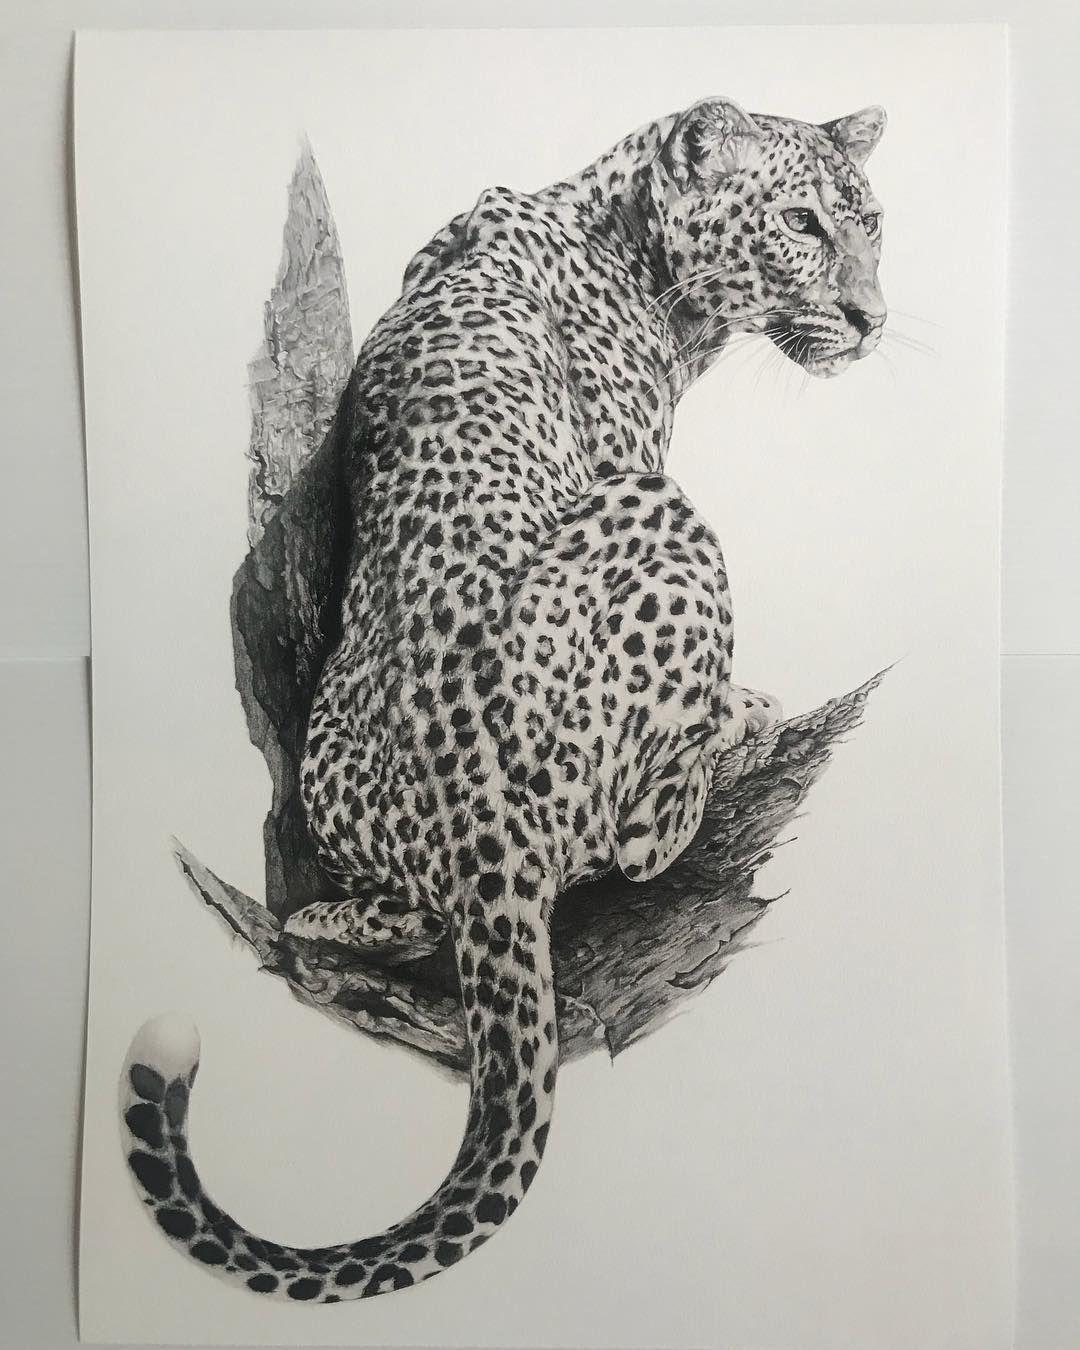 Big Cat CHEETAH pencil drawing artwork print A3 A4 sizes signed art